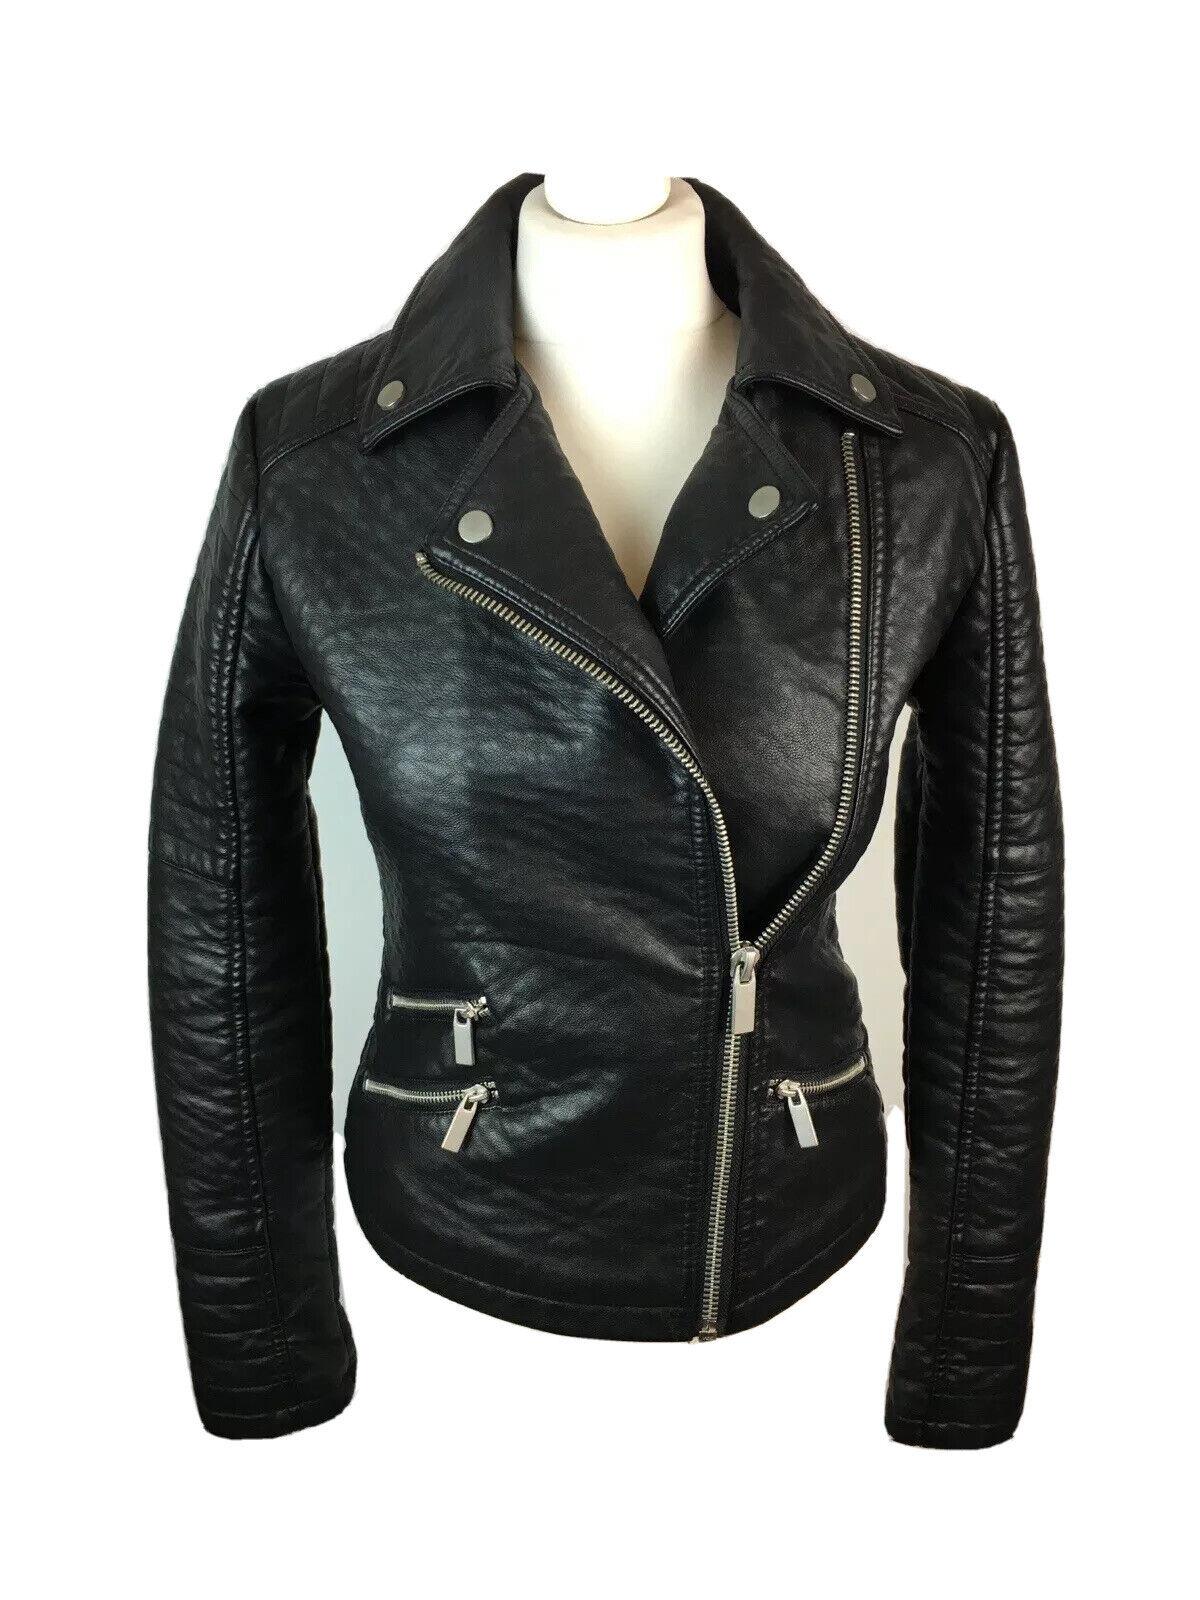 Asos Black Faux Leather Biker Jacket Size UK 8 Pockets Zips Moto